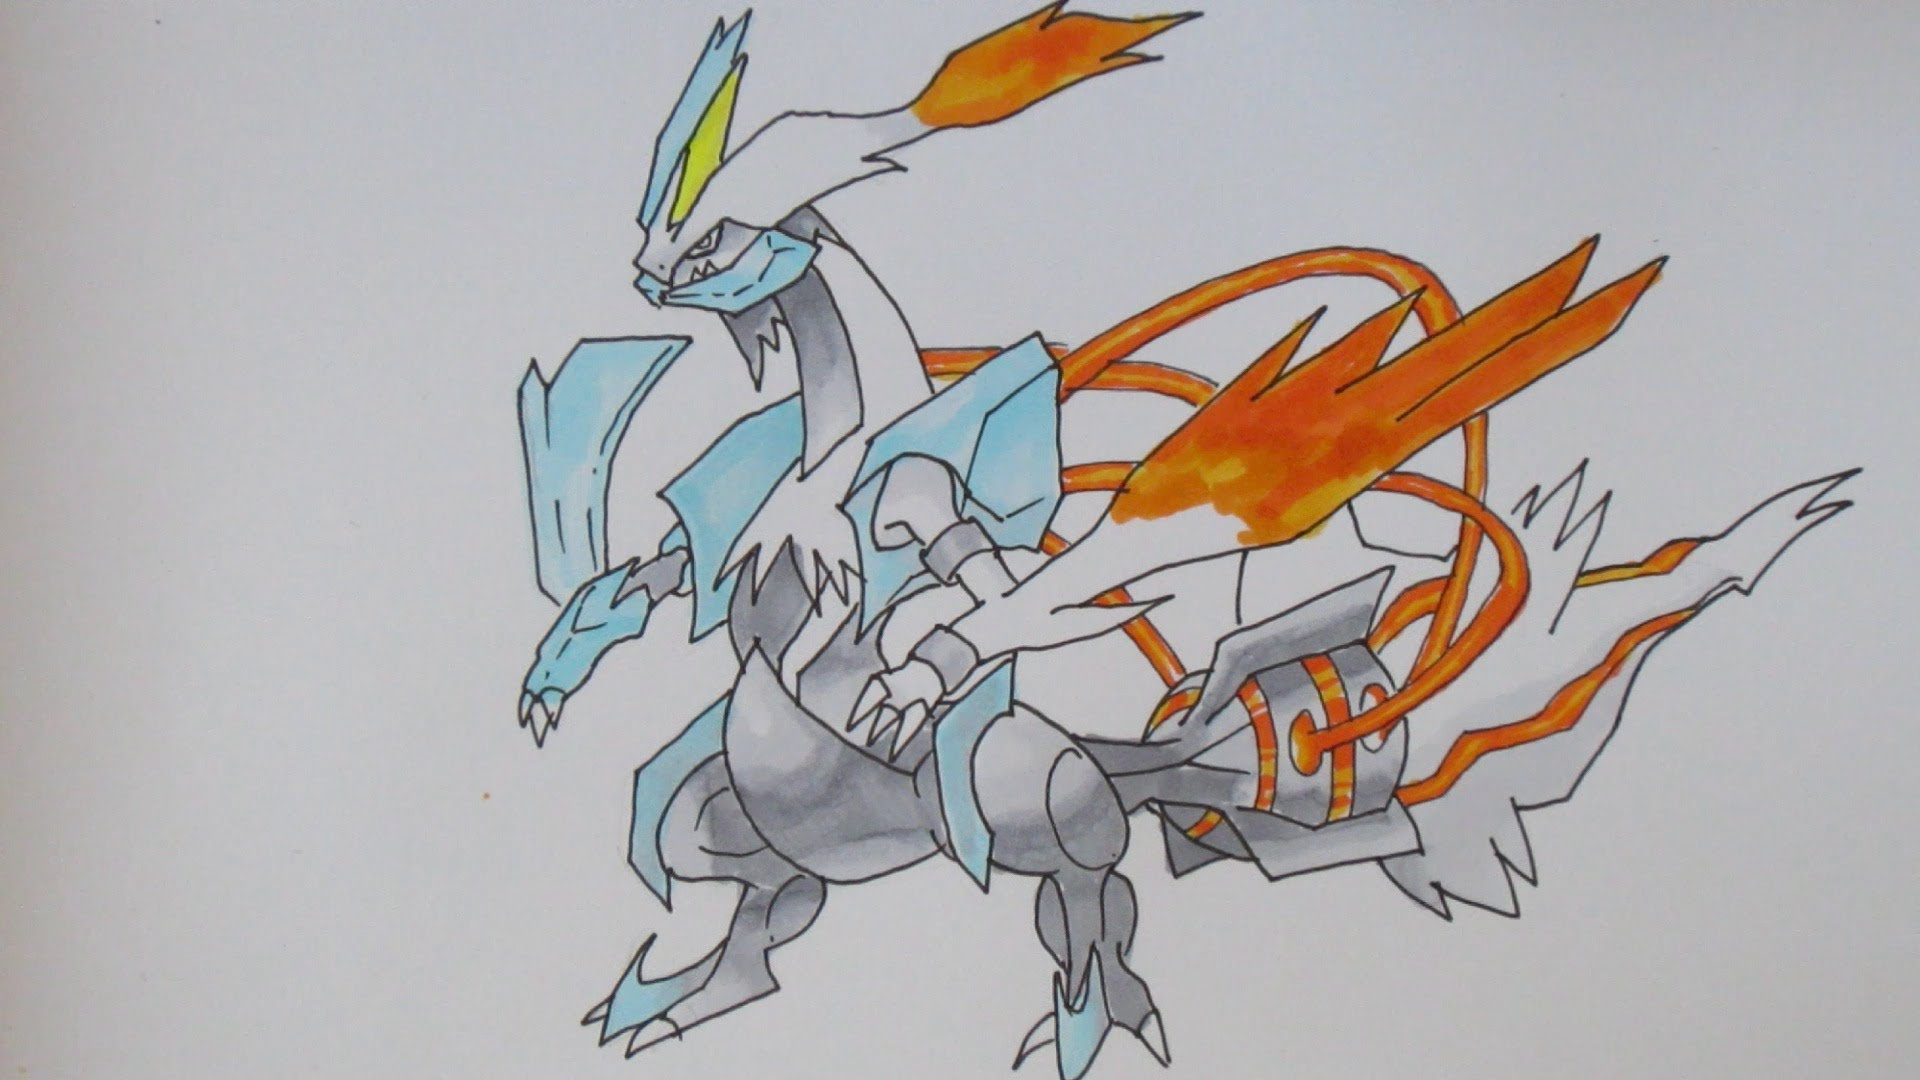 1920x1080 Cool Pokemon Drawings How To Draw Pokemon No.646 White Kyurem